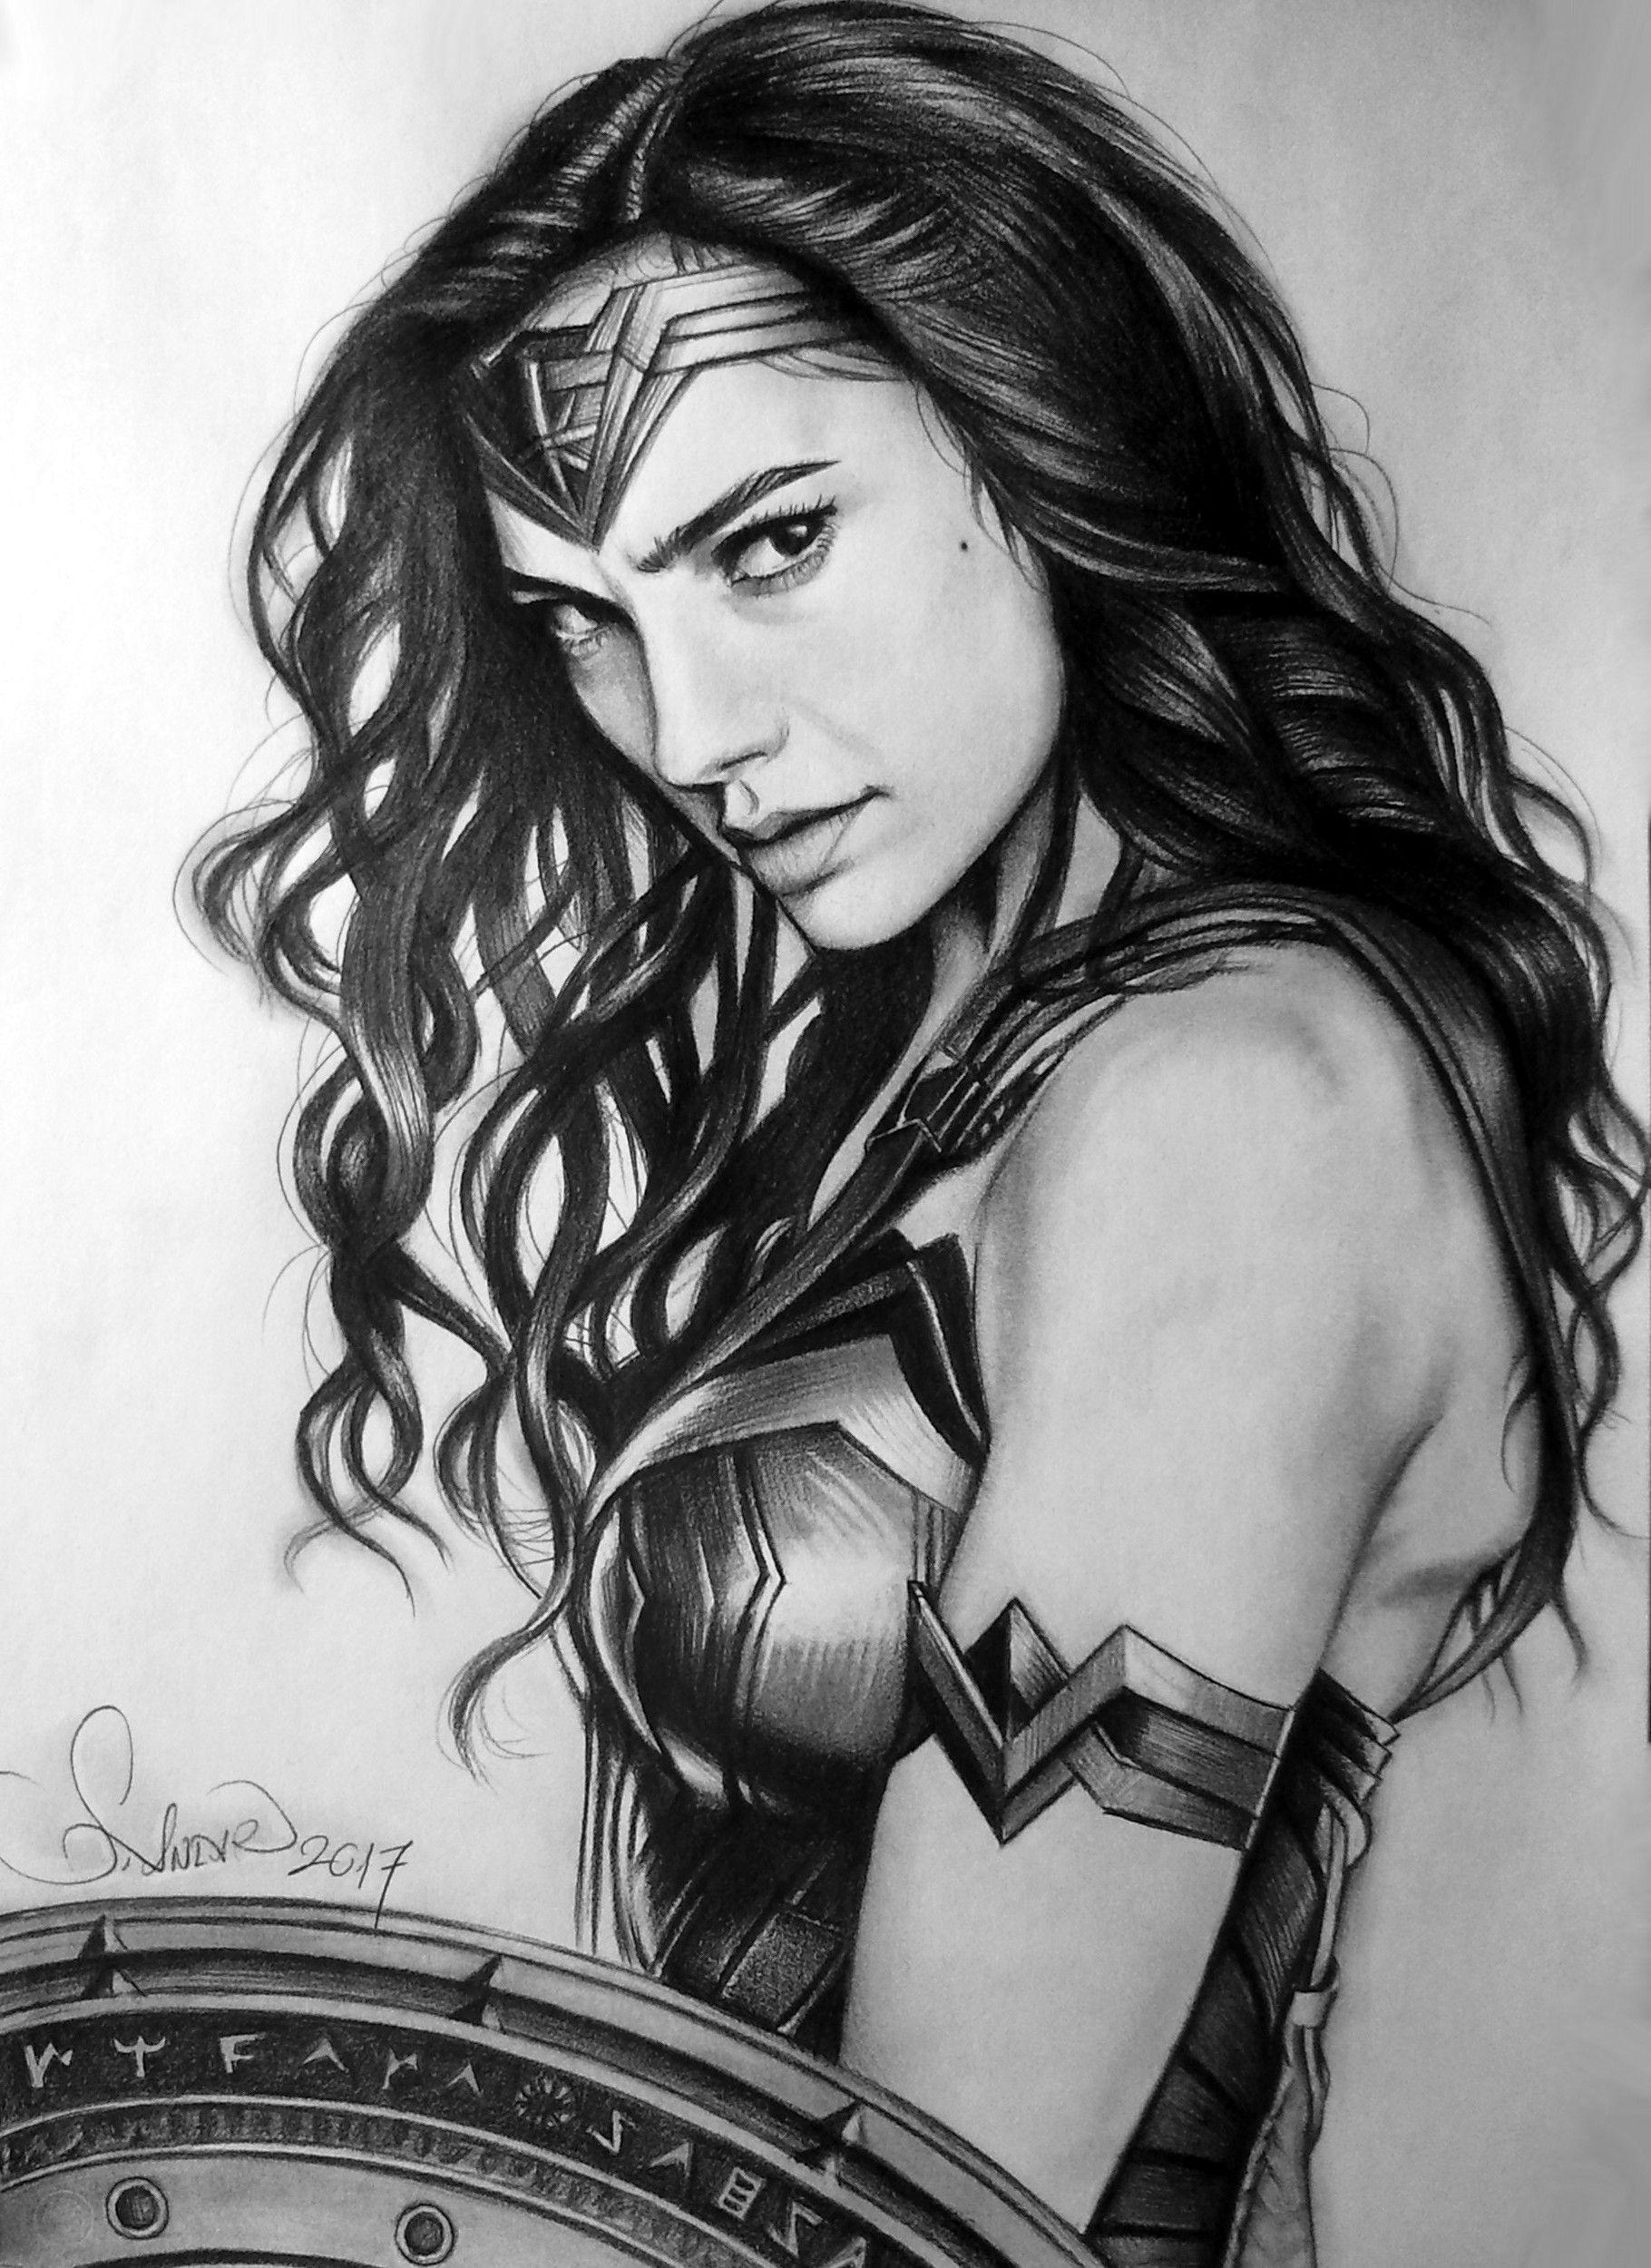 Wonder woman 8b 2b pencil drawing